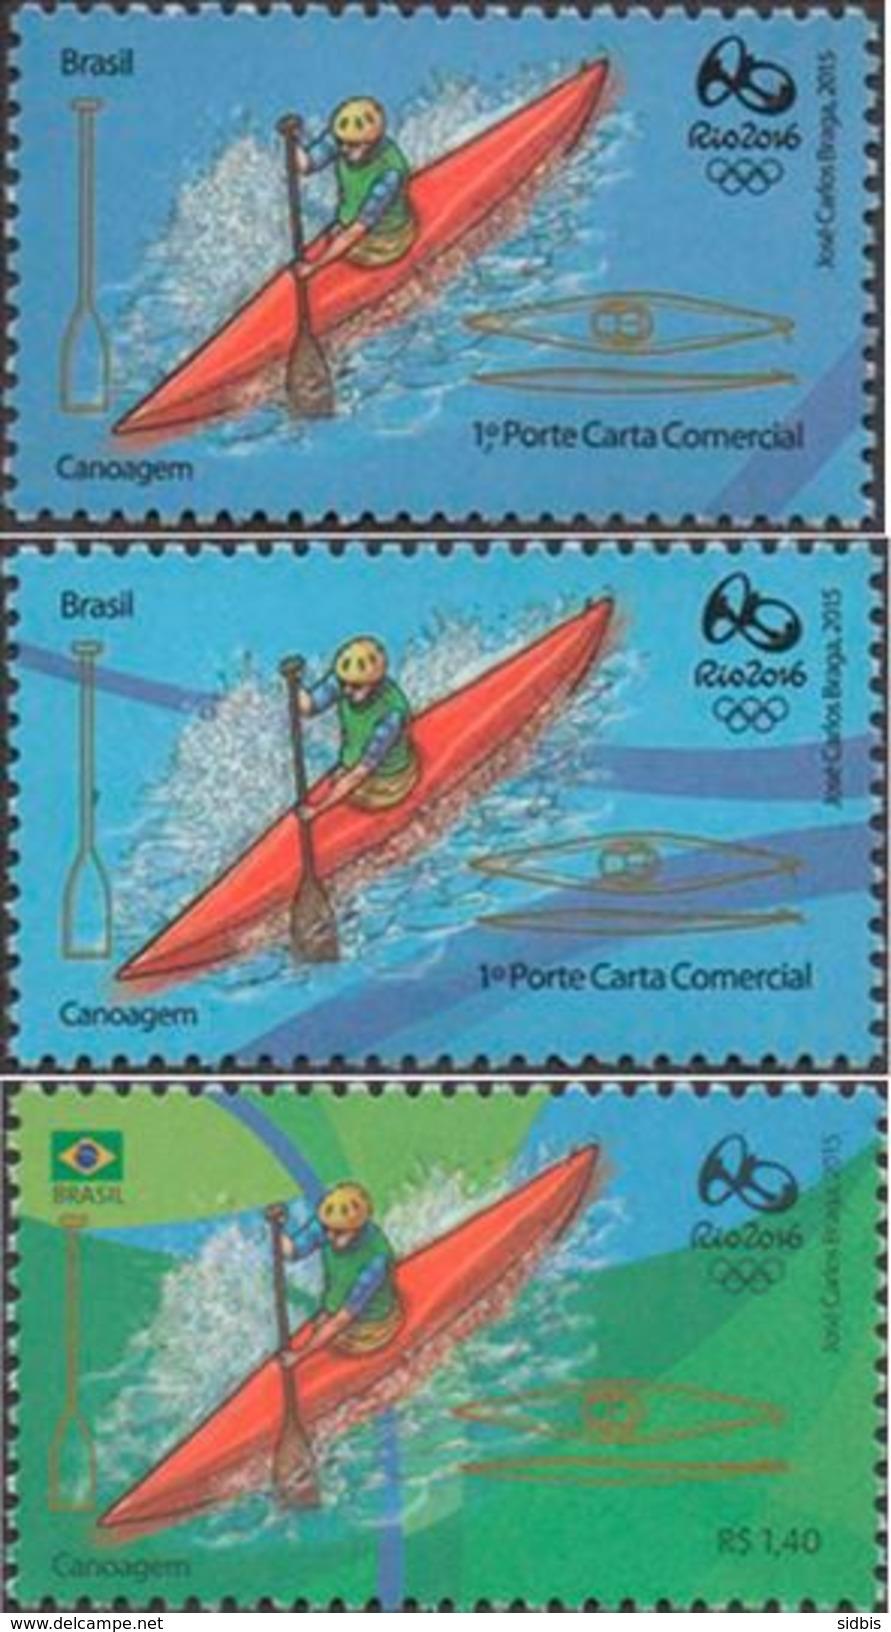 BRAZIL 2015 Olimpic Sport Games Rio 2016 Canoeing Canoagem - Unused Stamps